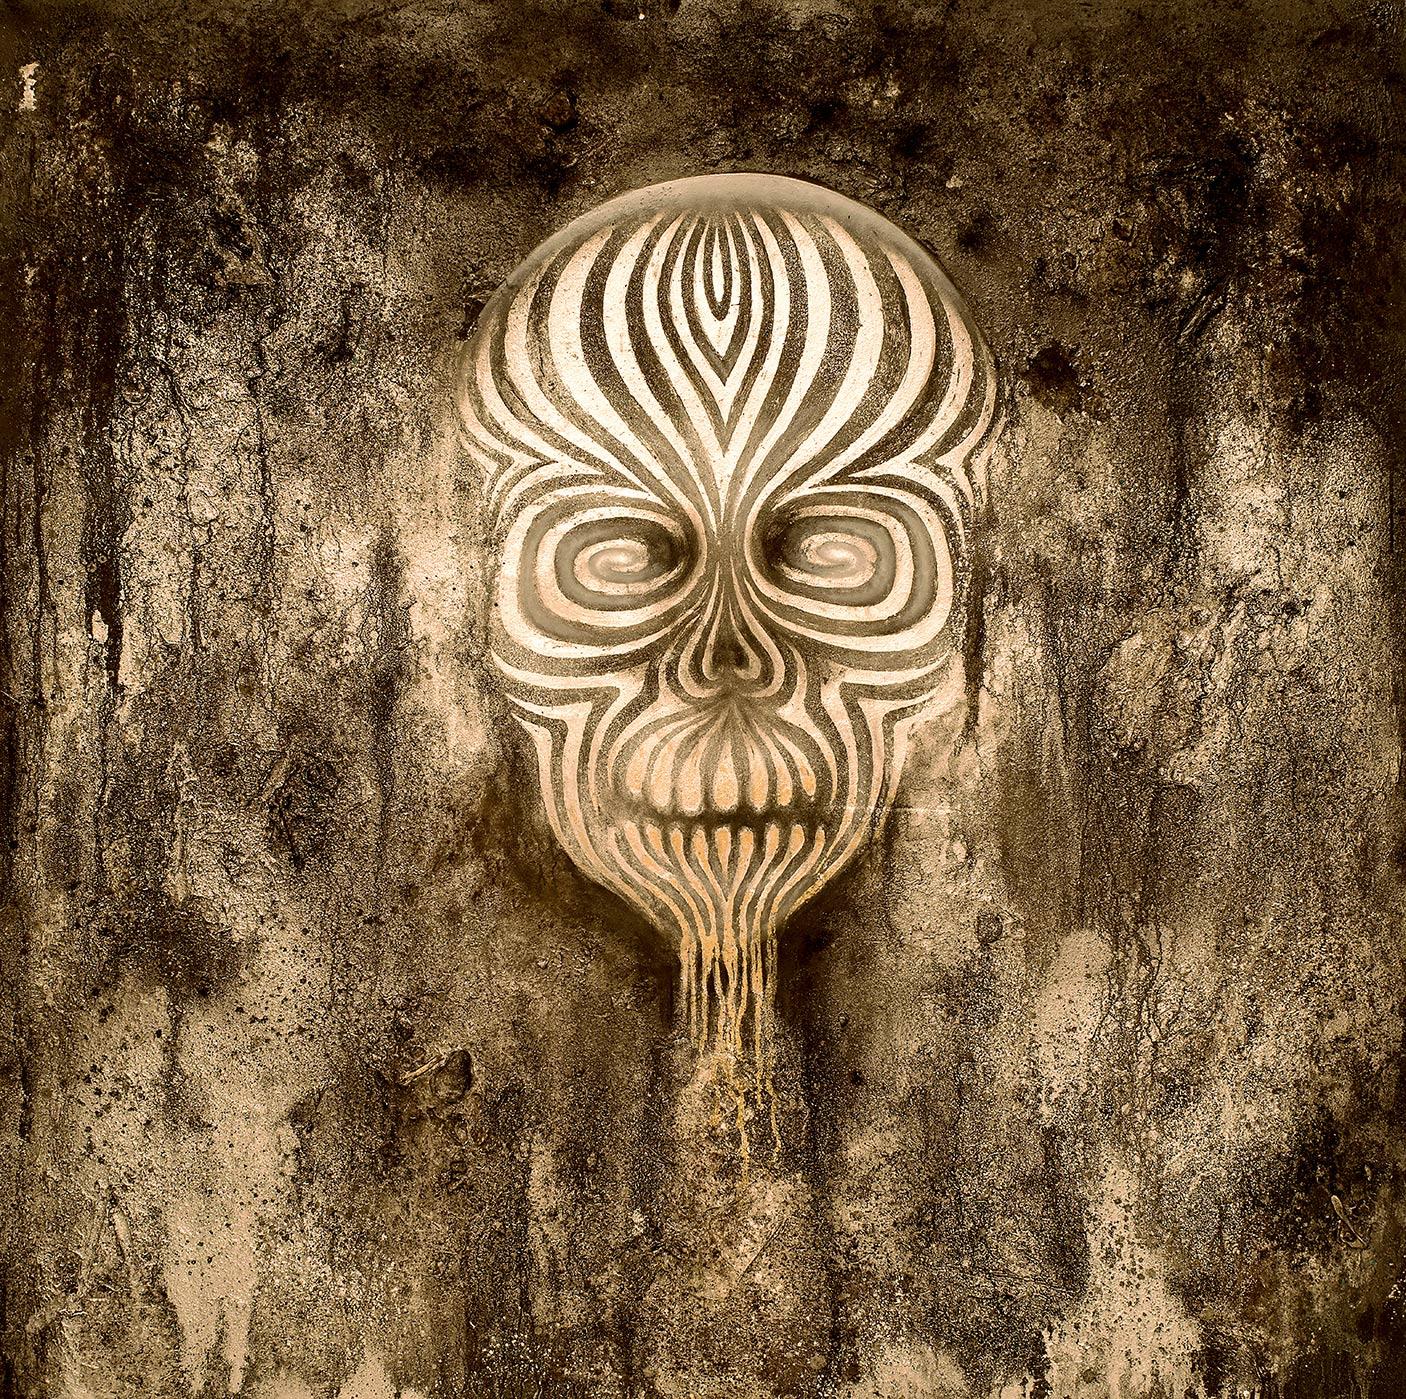 Tod (150x150cm) -Acryl, Kreide, Öl, Sprühlack, Schlagmetall, Pigmente auf Platte